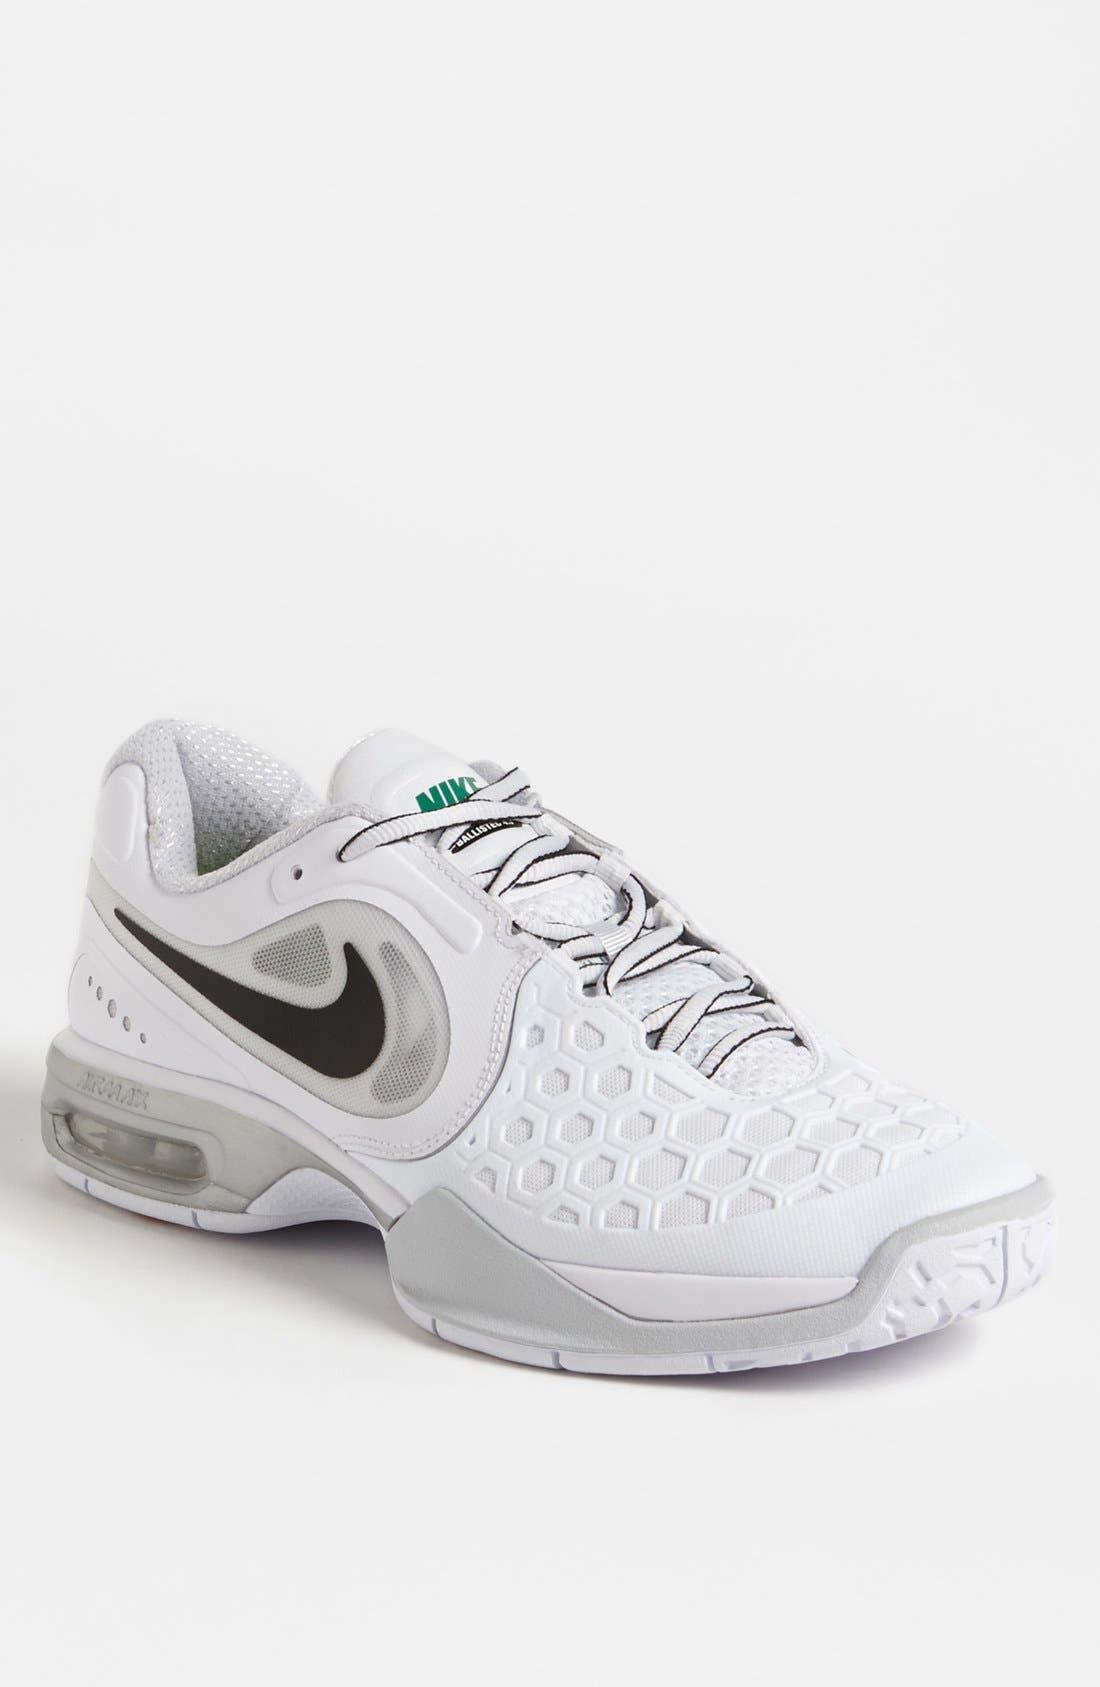 Alternate Image 1 Selected - Nike 'Air Max Court Ballistec 4.3' Tennis Shoe (Men)